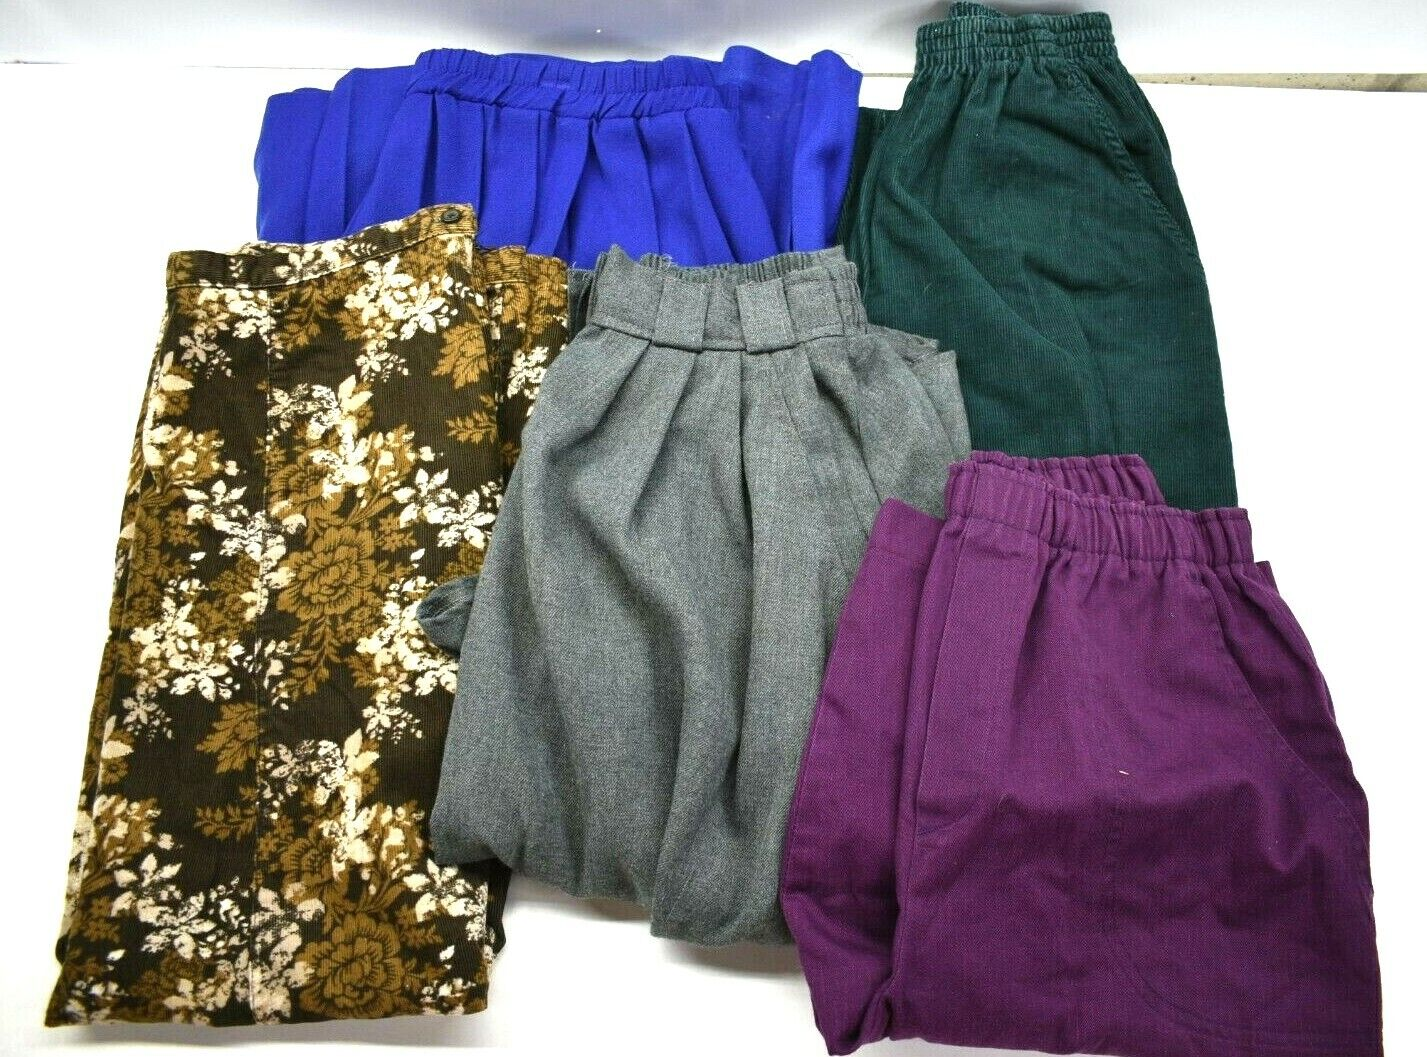 Lot of 5 Cabin Creek Croft Barrow Women's Size 8 Spring Casual Pants Skirts